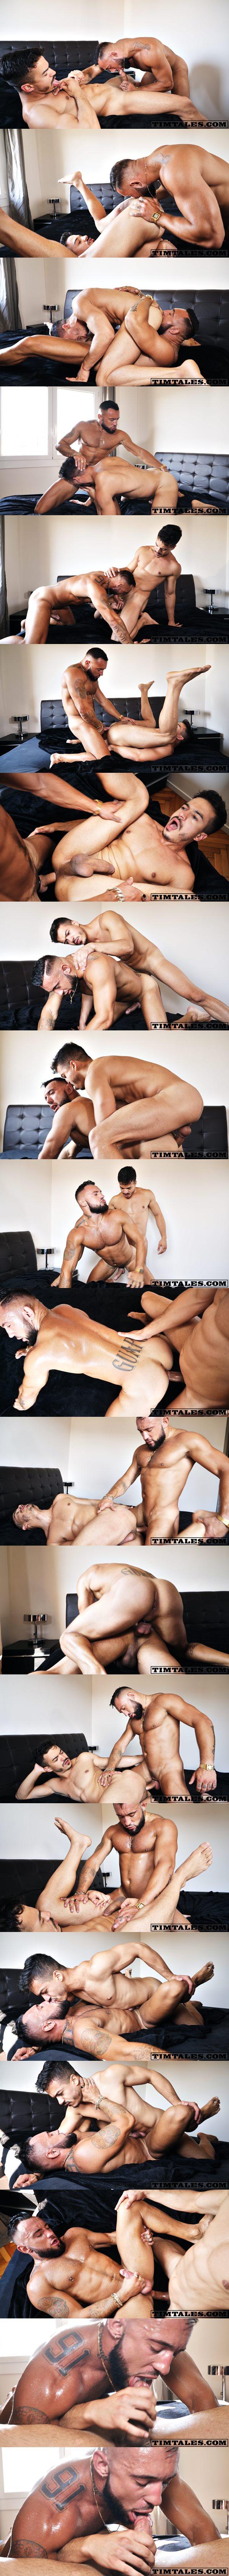 Jake Cook and Jonathan Miranda bareback flip fuck in jake's bottoming debut at Timtales 02